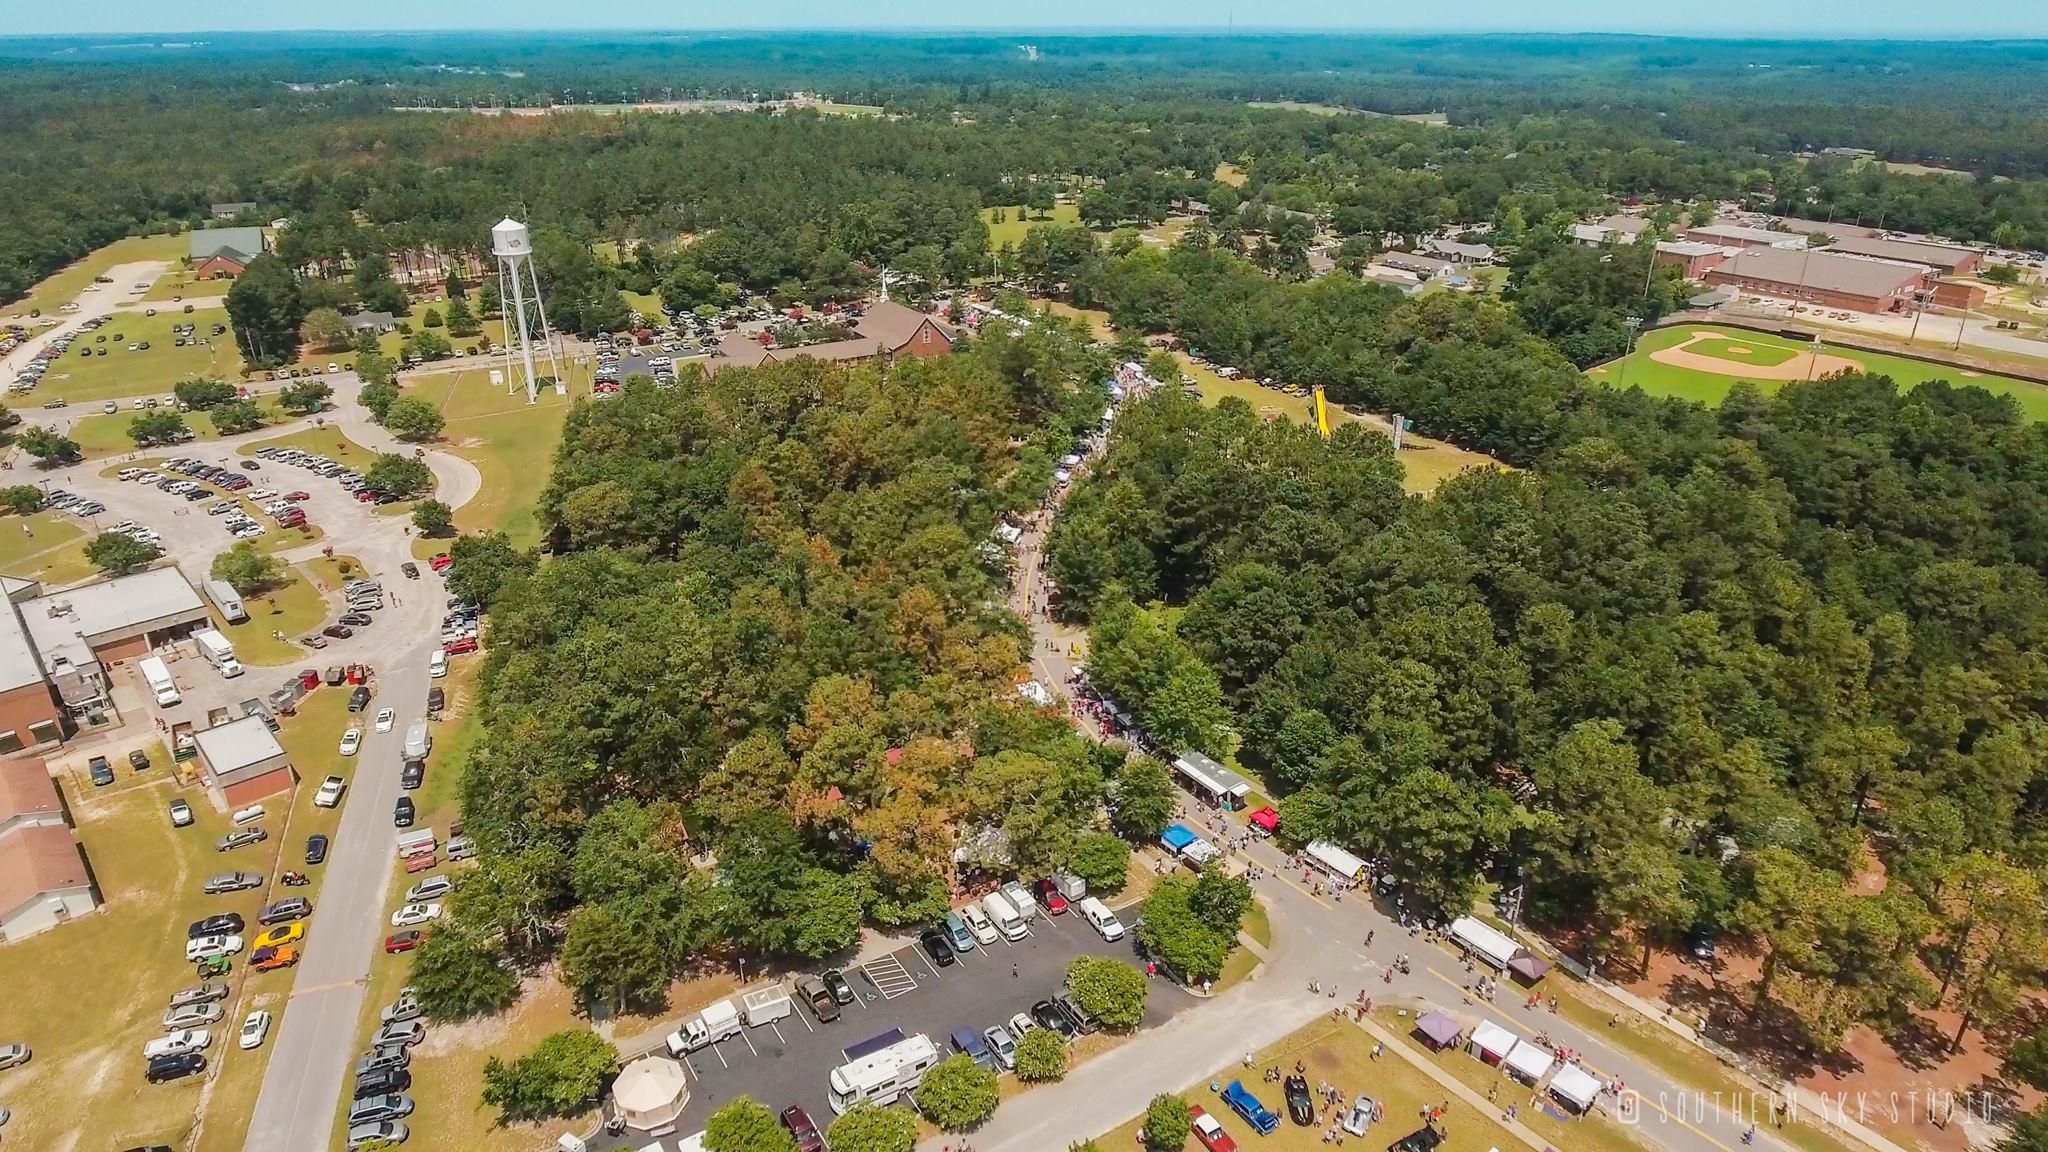 Photo Credit: Southern Sky Studio. The Lexington County Peach Festival at Gilbert Community Park. July 4, 2017.